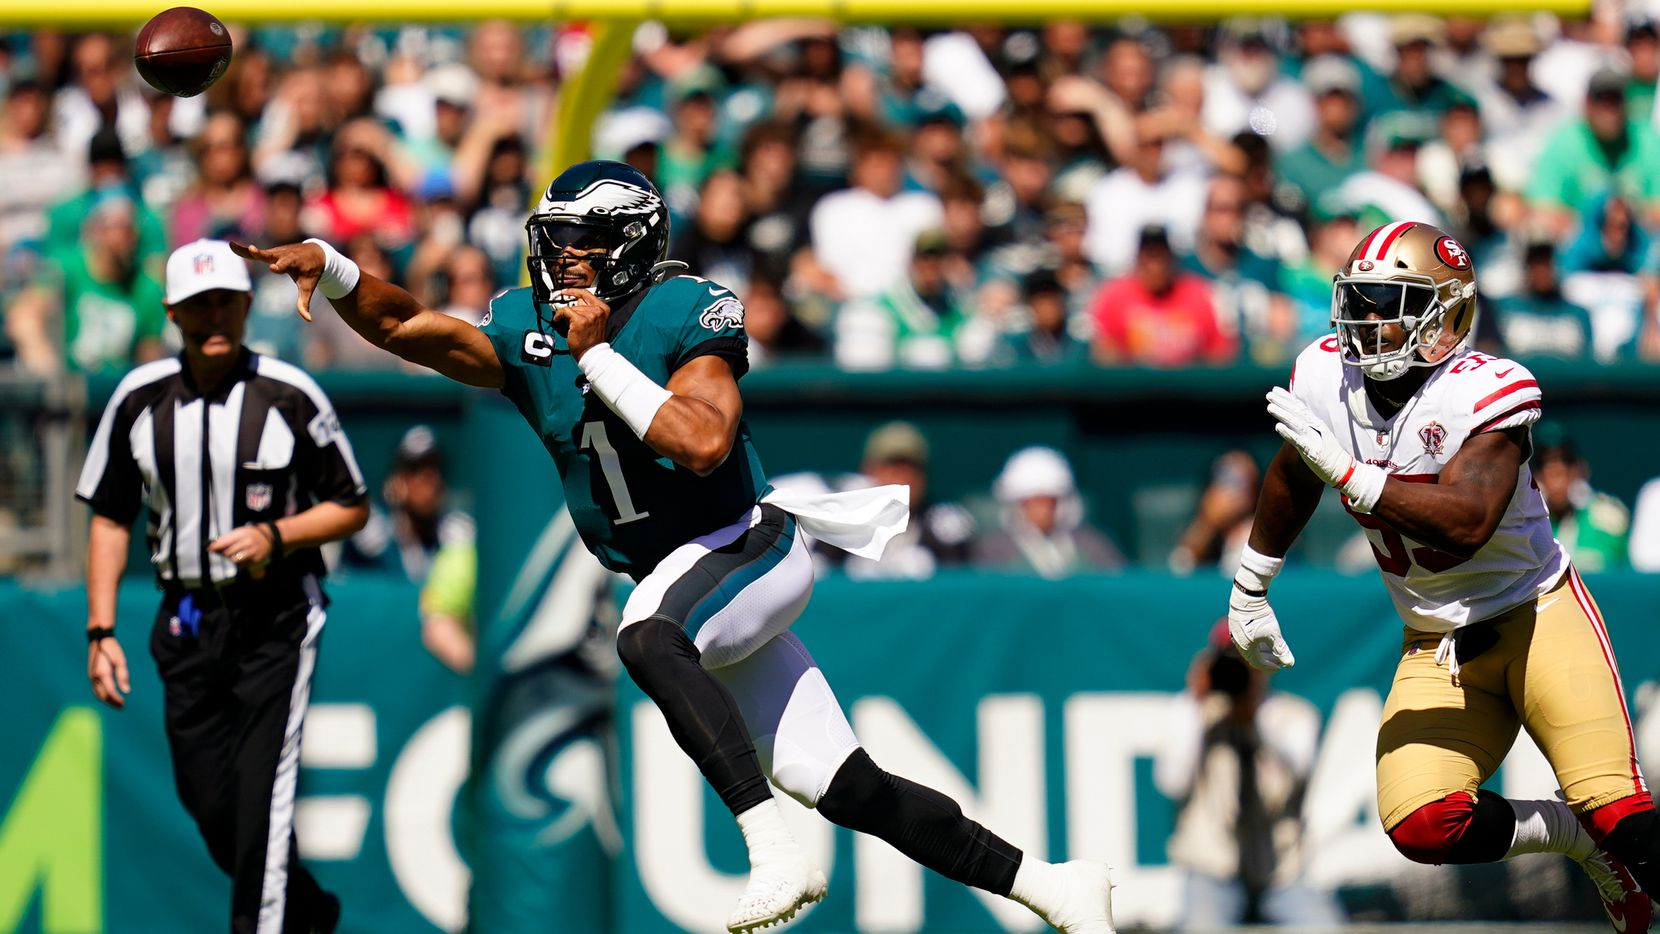 Philadelphia Eagles quarterback Jalen Hurts (1) passes during the first half of an NFL football game against the San Francisco 49ers on Sunday, Sept. 19, 2021, in Philadelphia. (AP Photo/Matt Slocum)